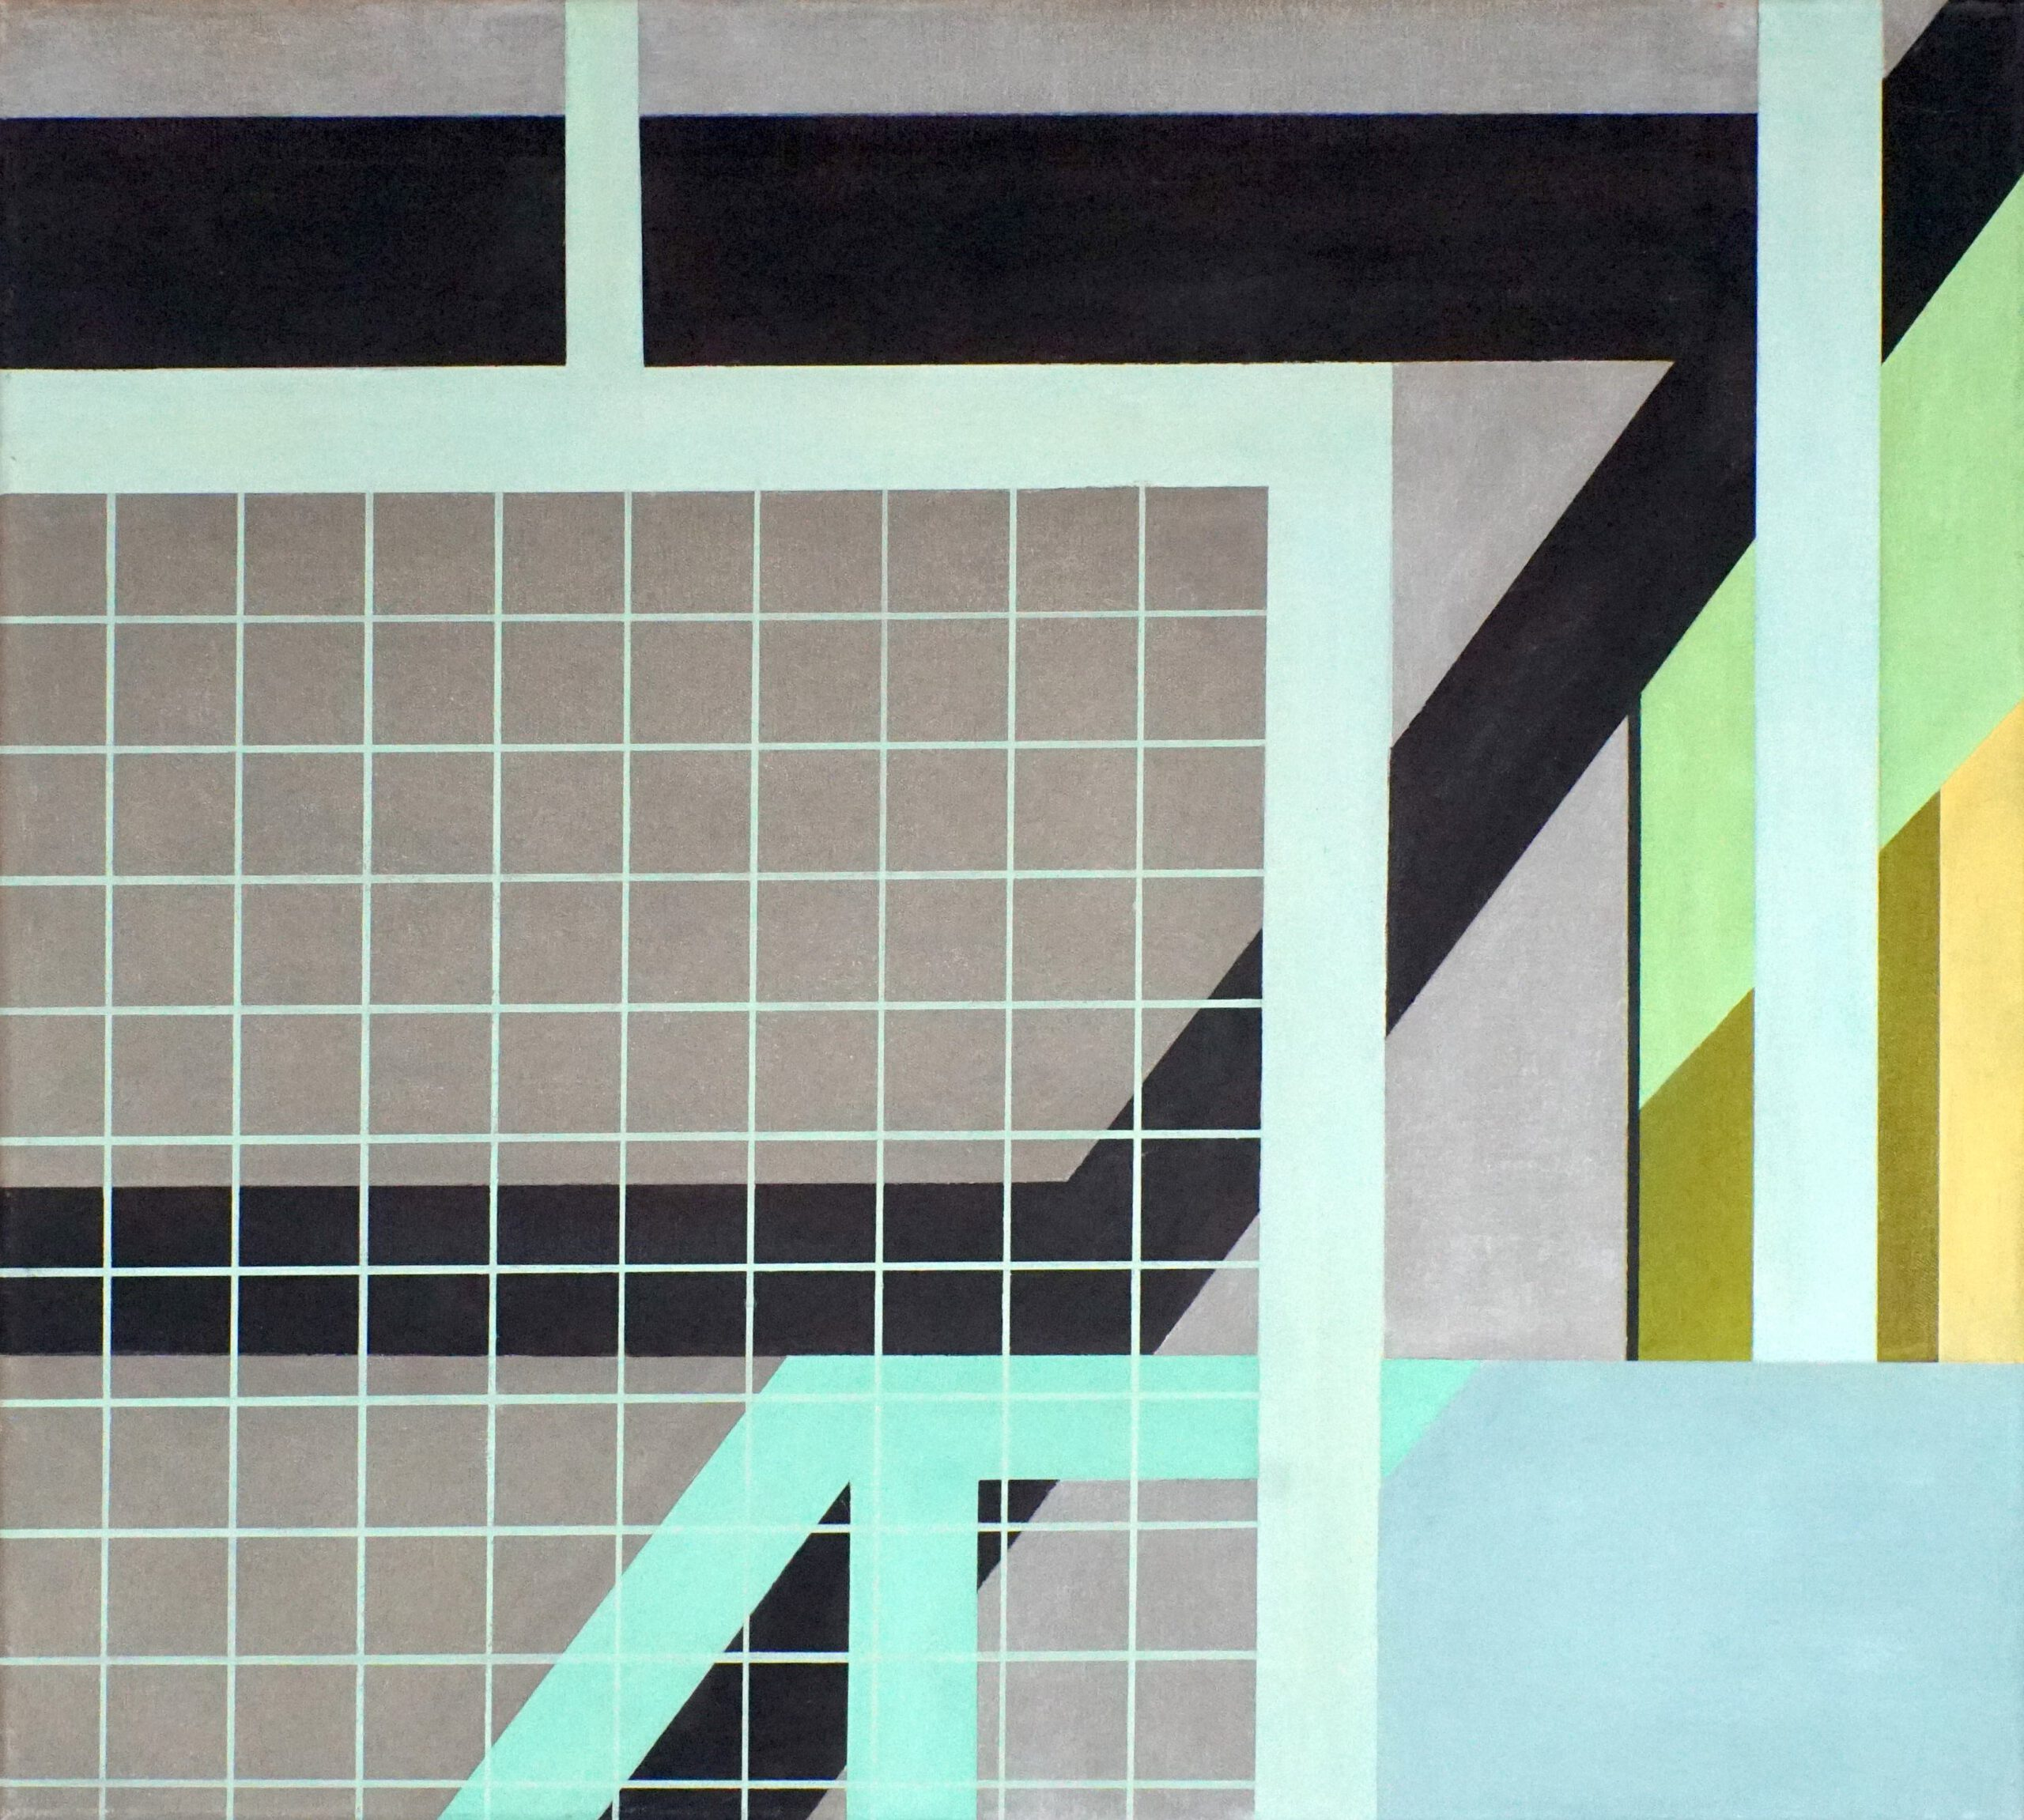 Tagbilaran II, 2018, 45 x 50 cm, Öl/Lw, Oil on Canvas